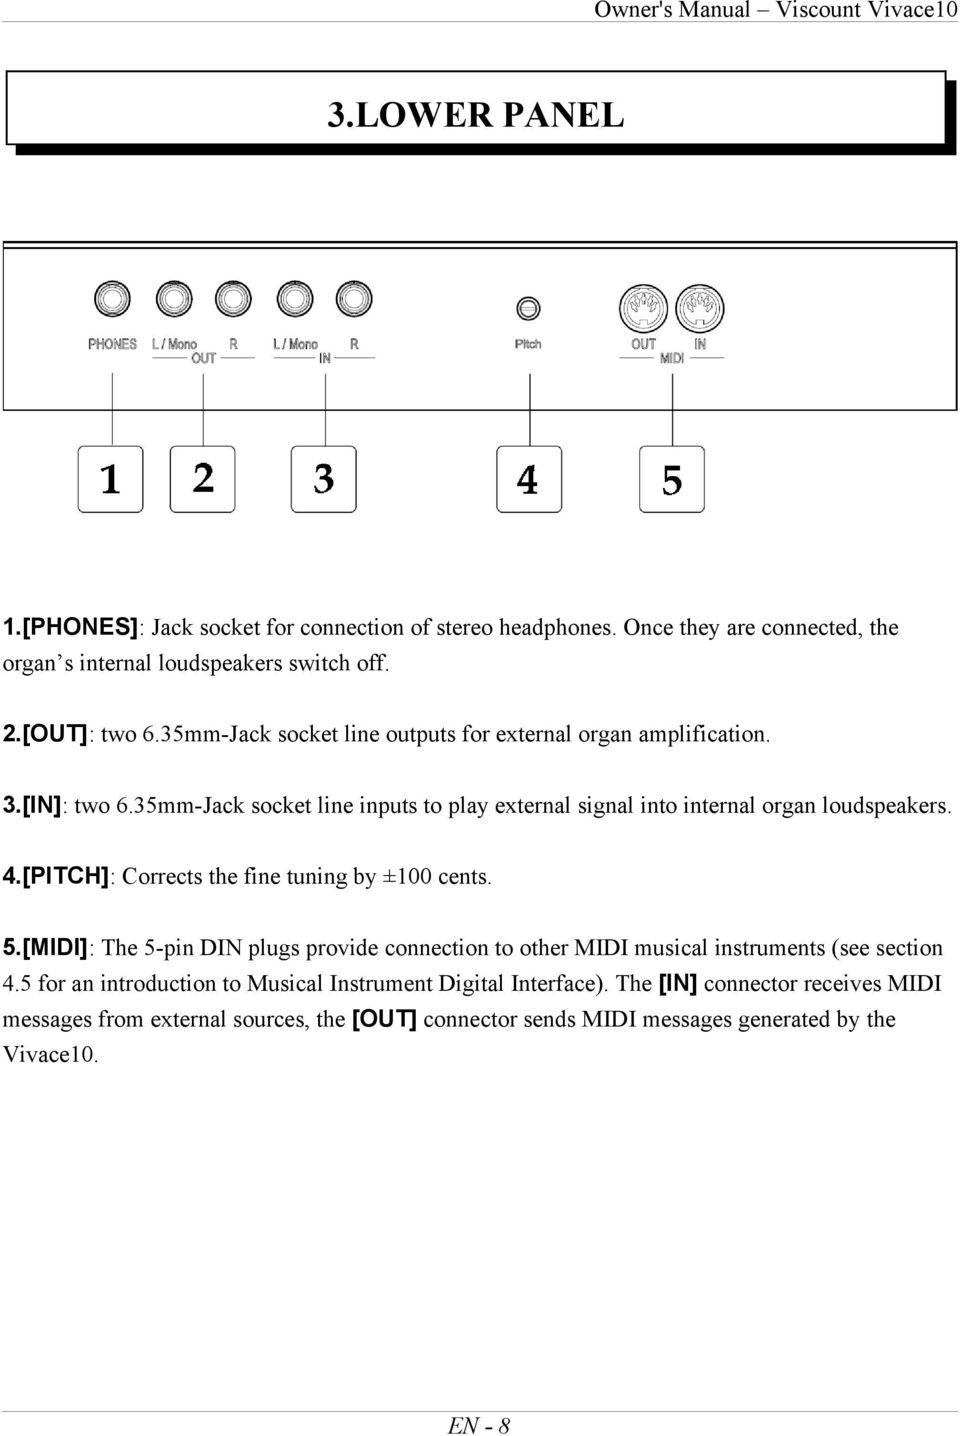 Manuale D Uso Viscount Vivace10 Pdf Gratis Download